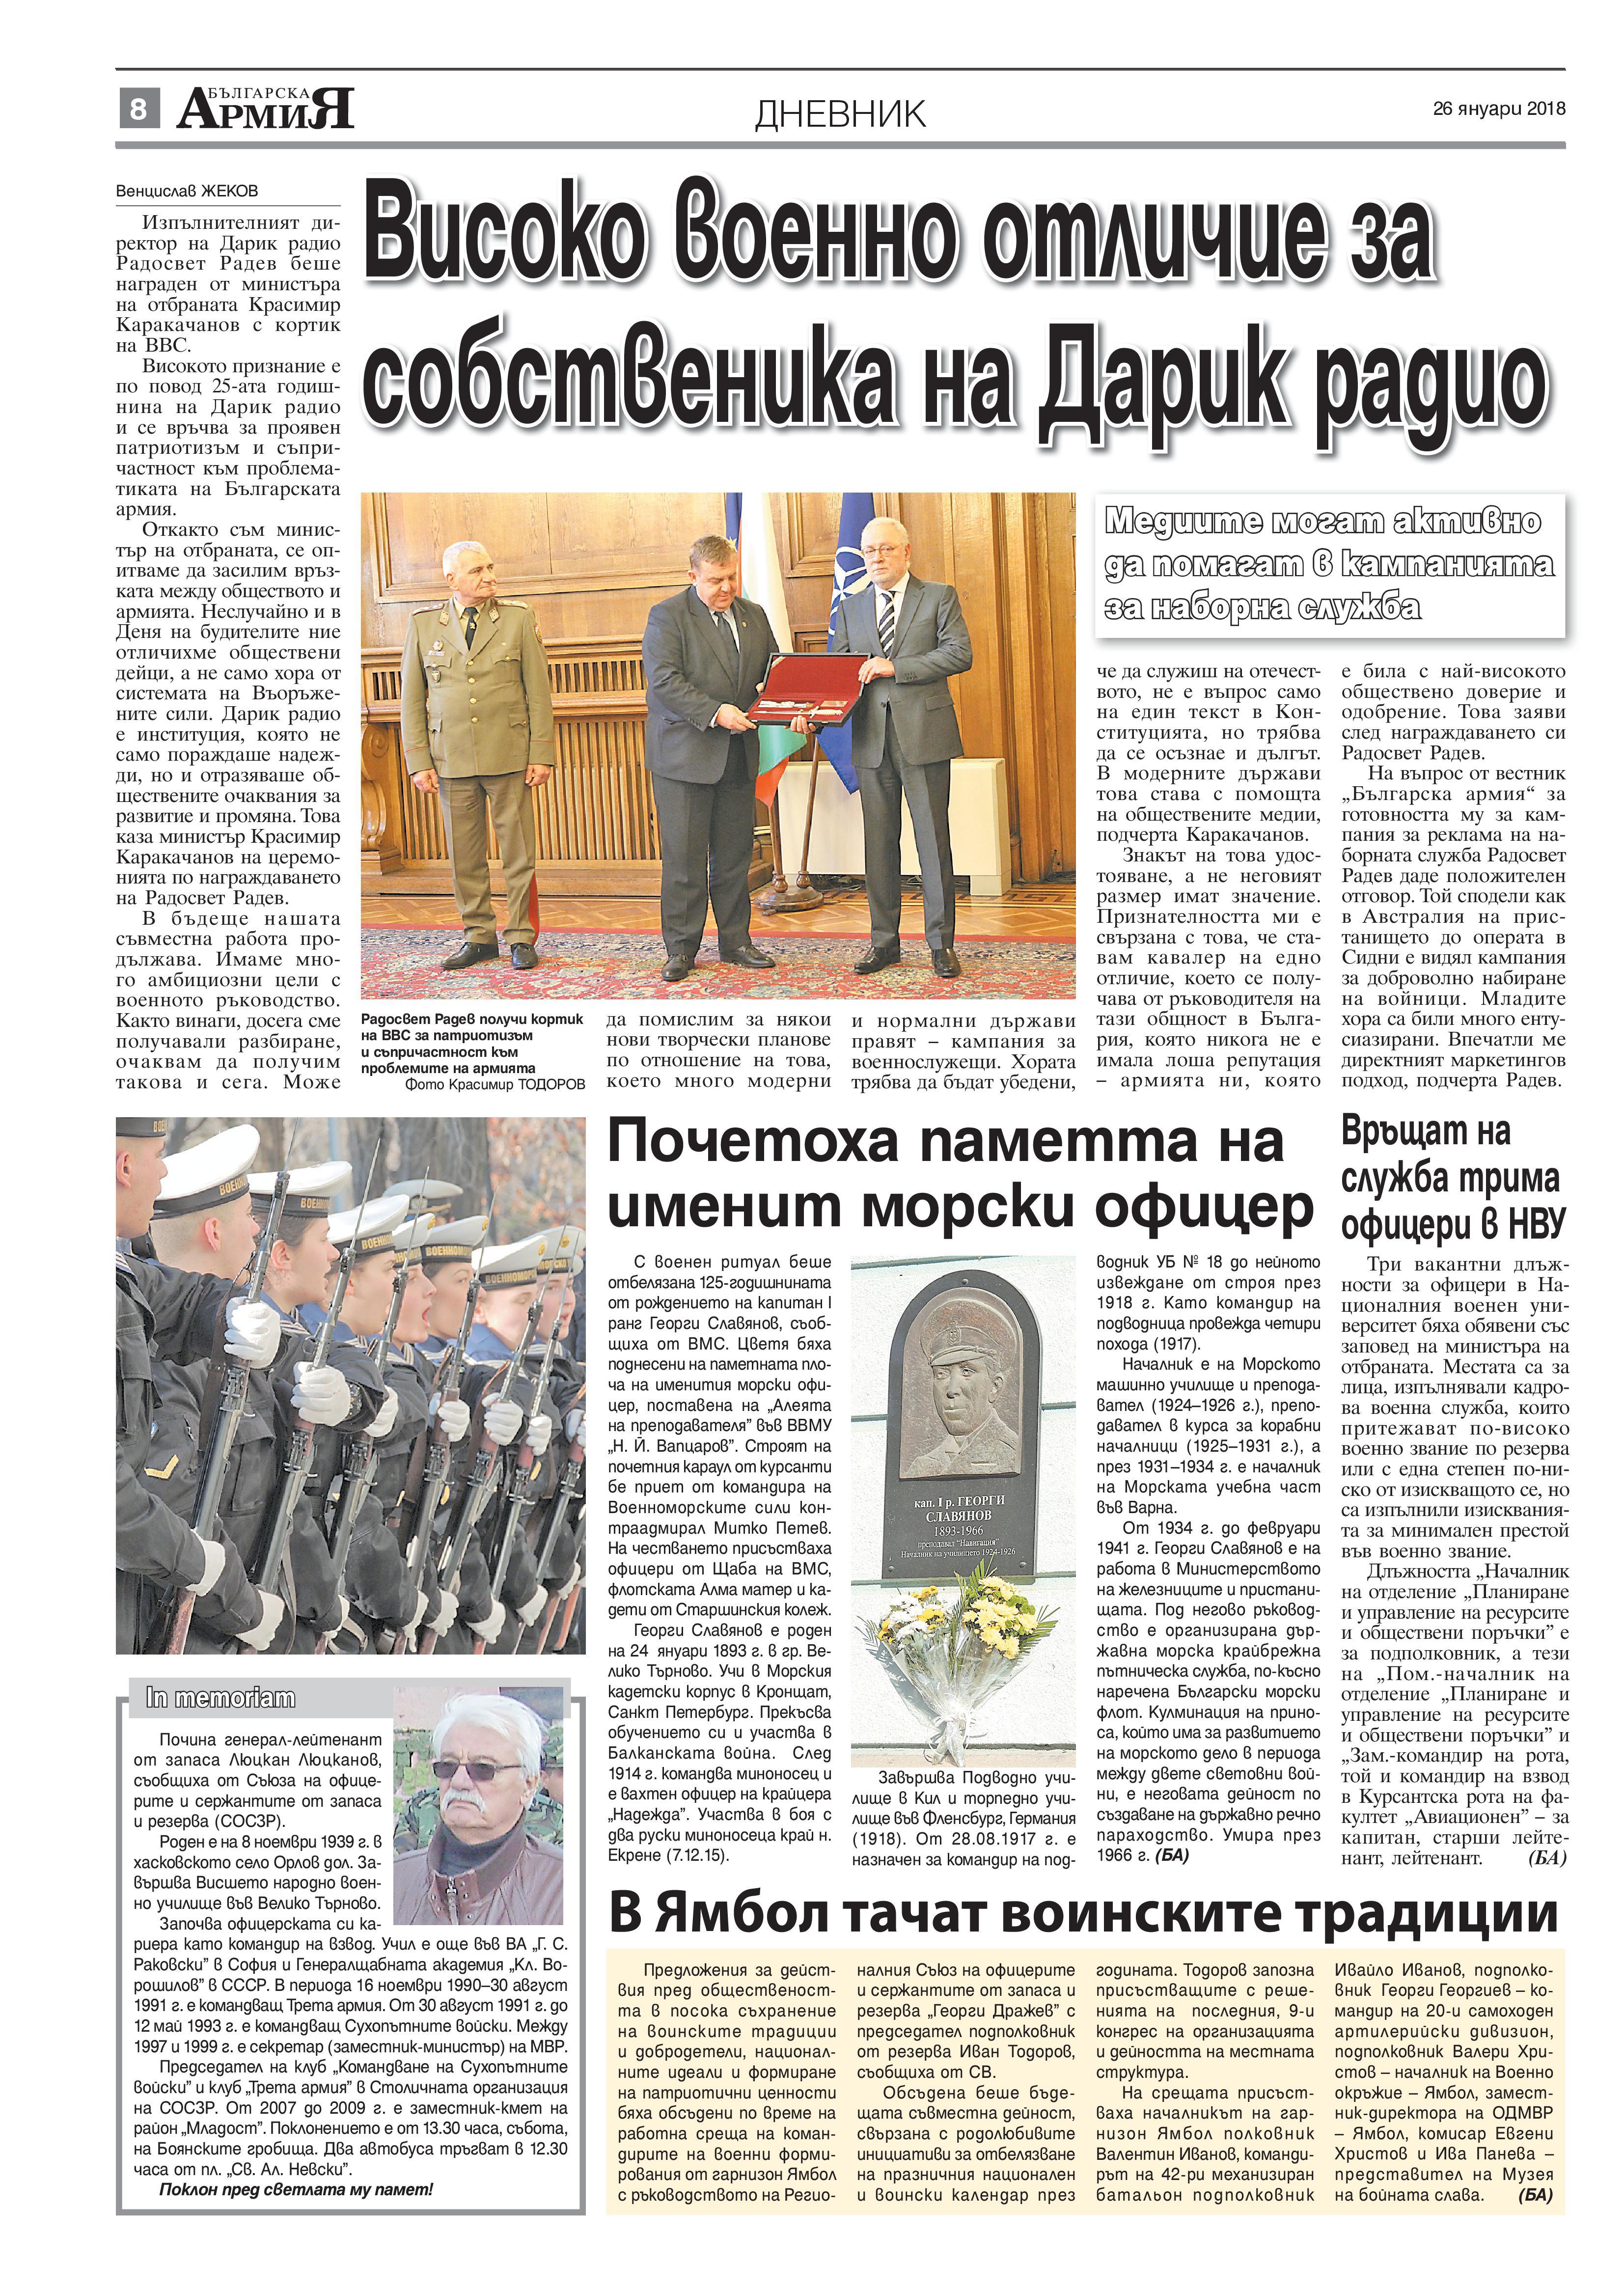 https://armymedia.bg/wp-content/uploads/2015/06/08-17.jpg